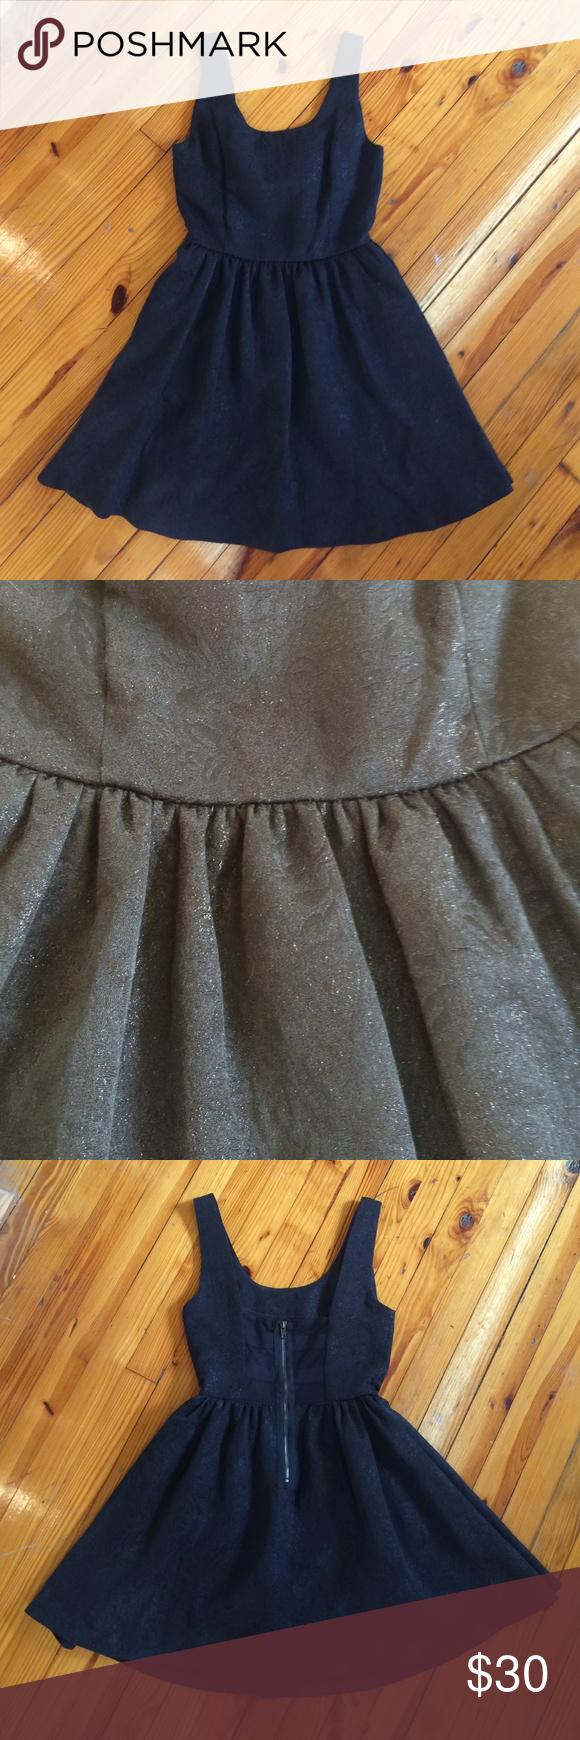 Princess Vera Wang Skater Dress 👸 Textured, yet subtle black on black floral pattern dress with metallic thread. Worn once. Zipper detail back w/ sheer patches. Size in dress says 1. Princess Vera Wang Dresses